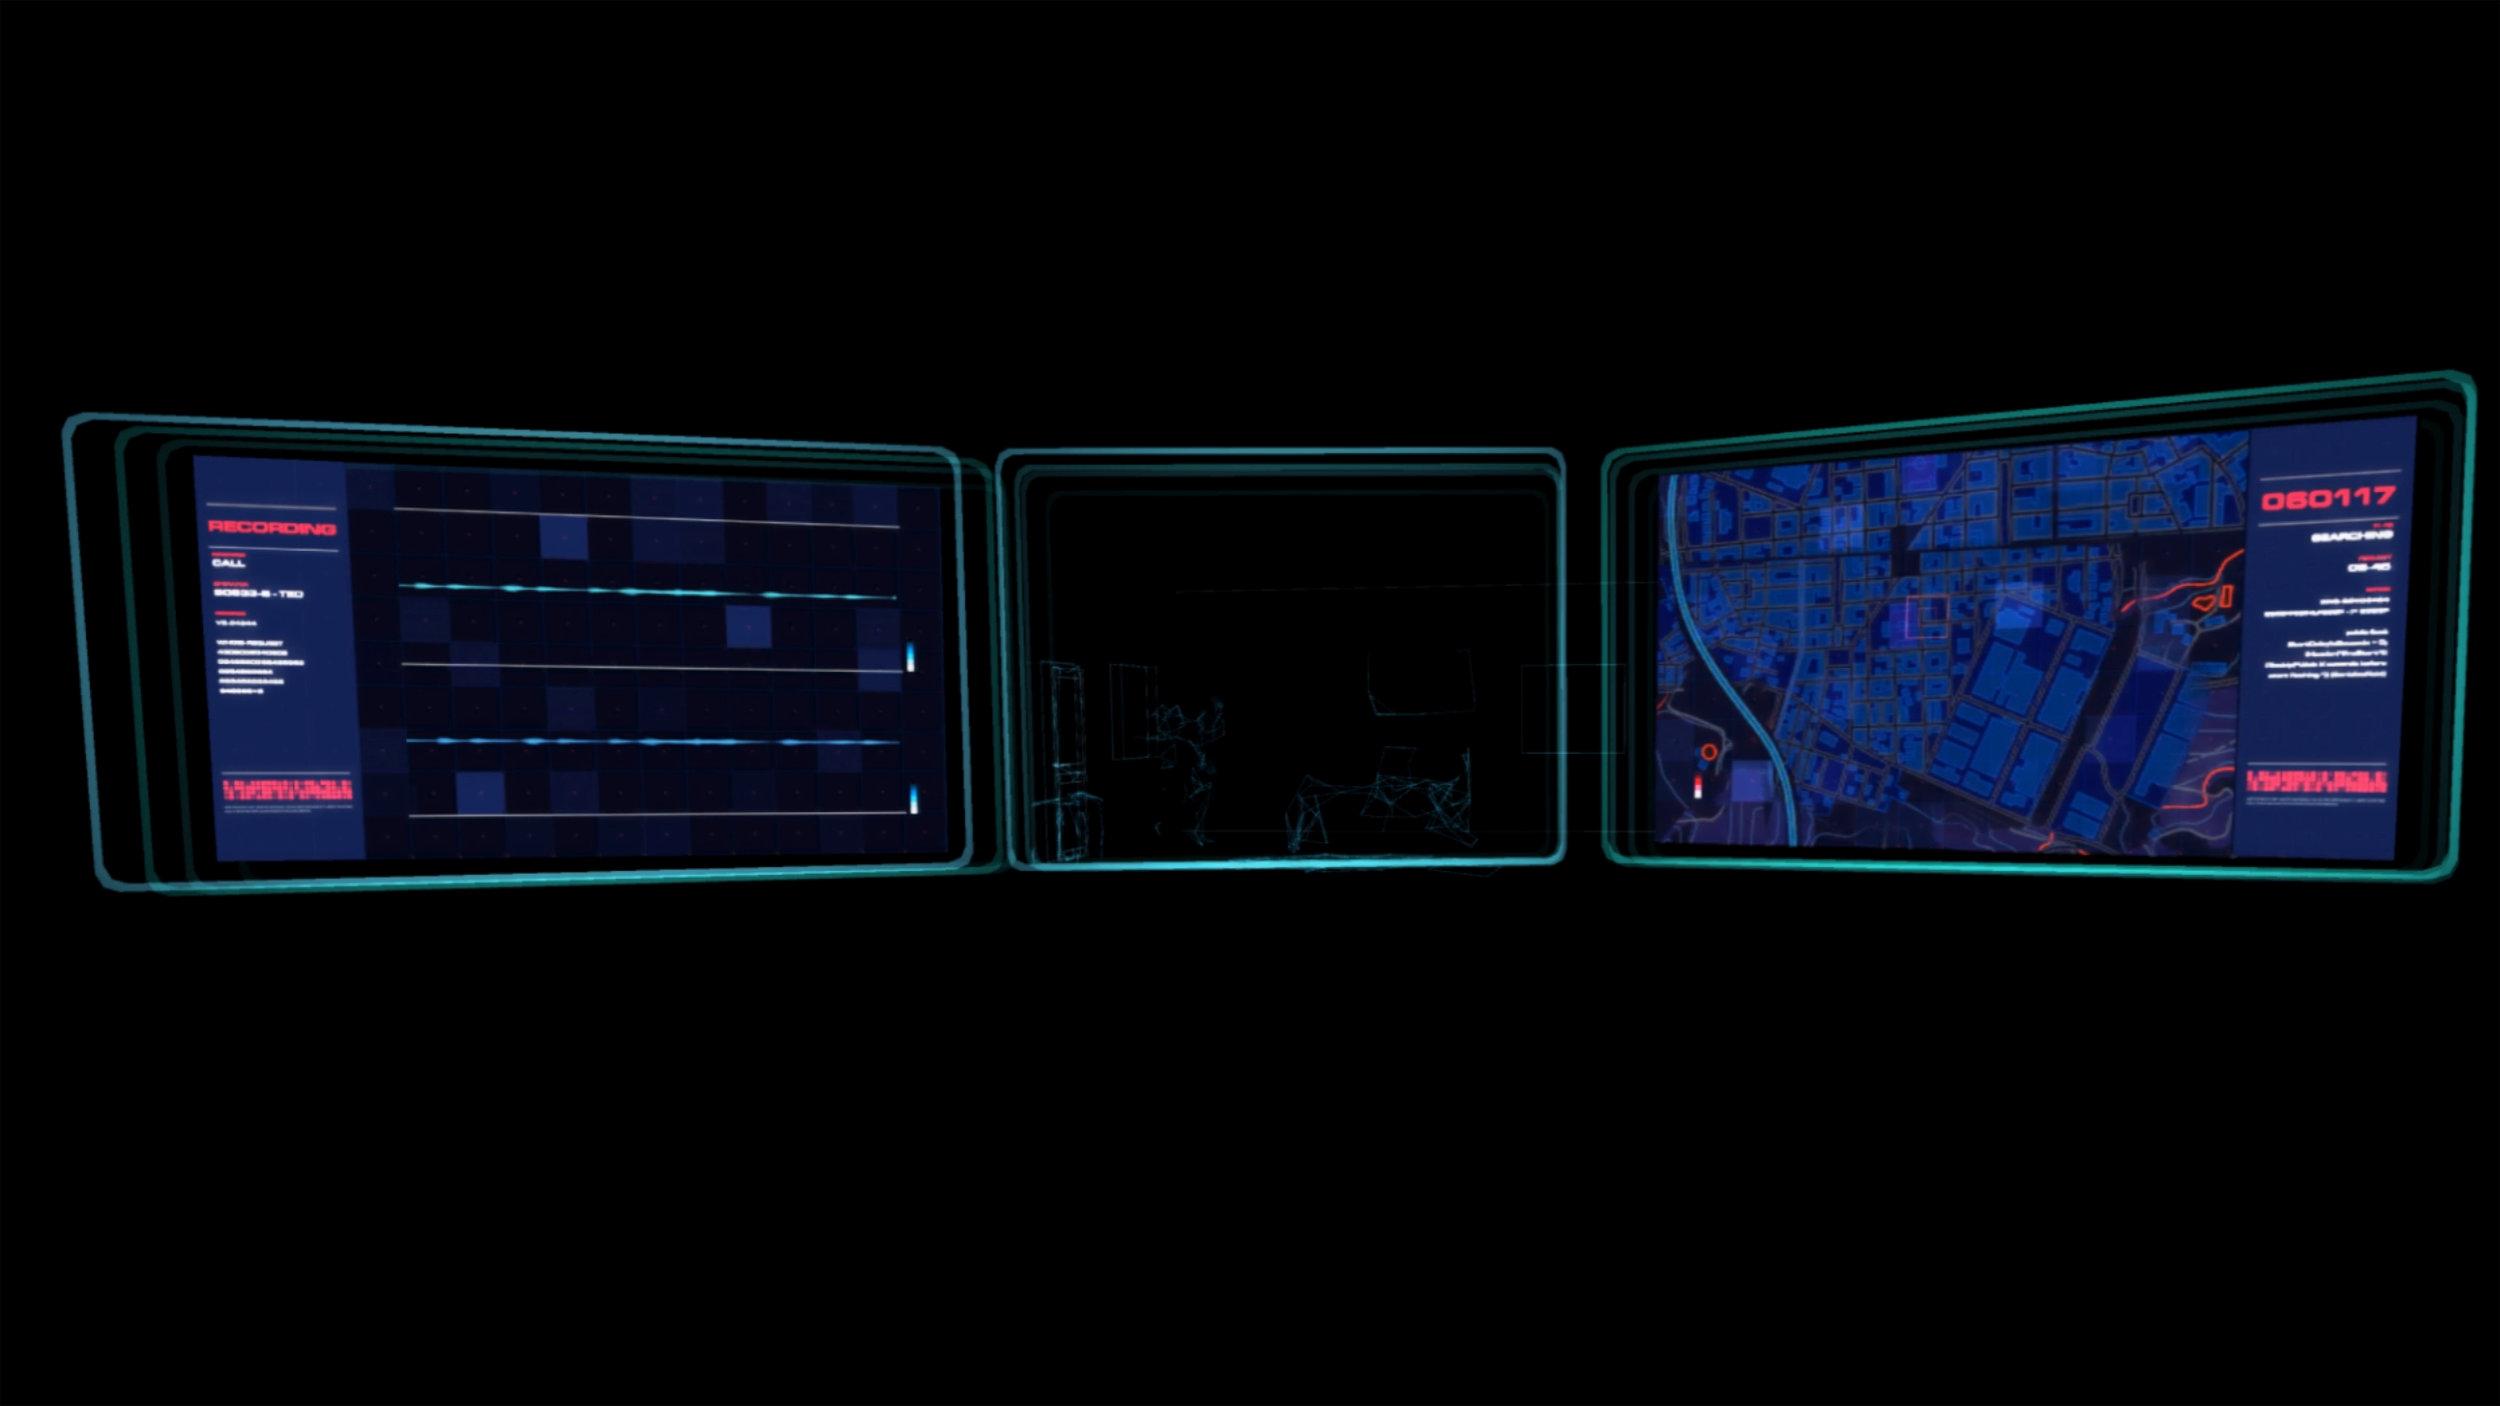 Displays_Sundance2.jpg